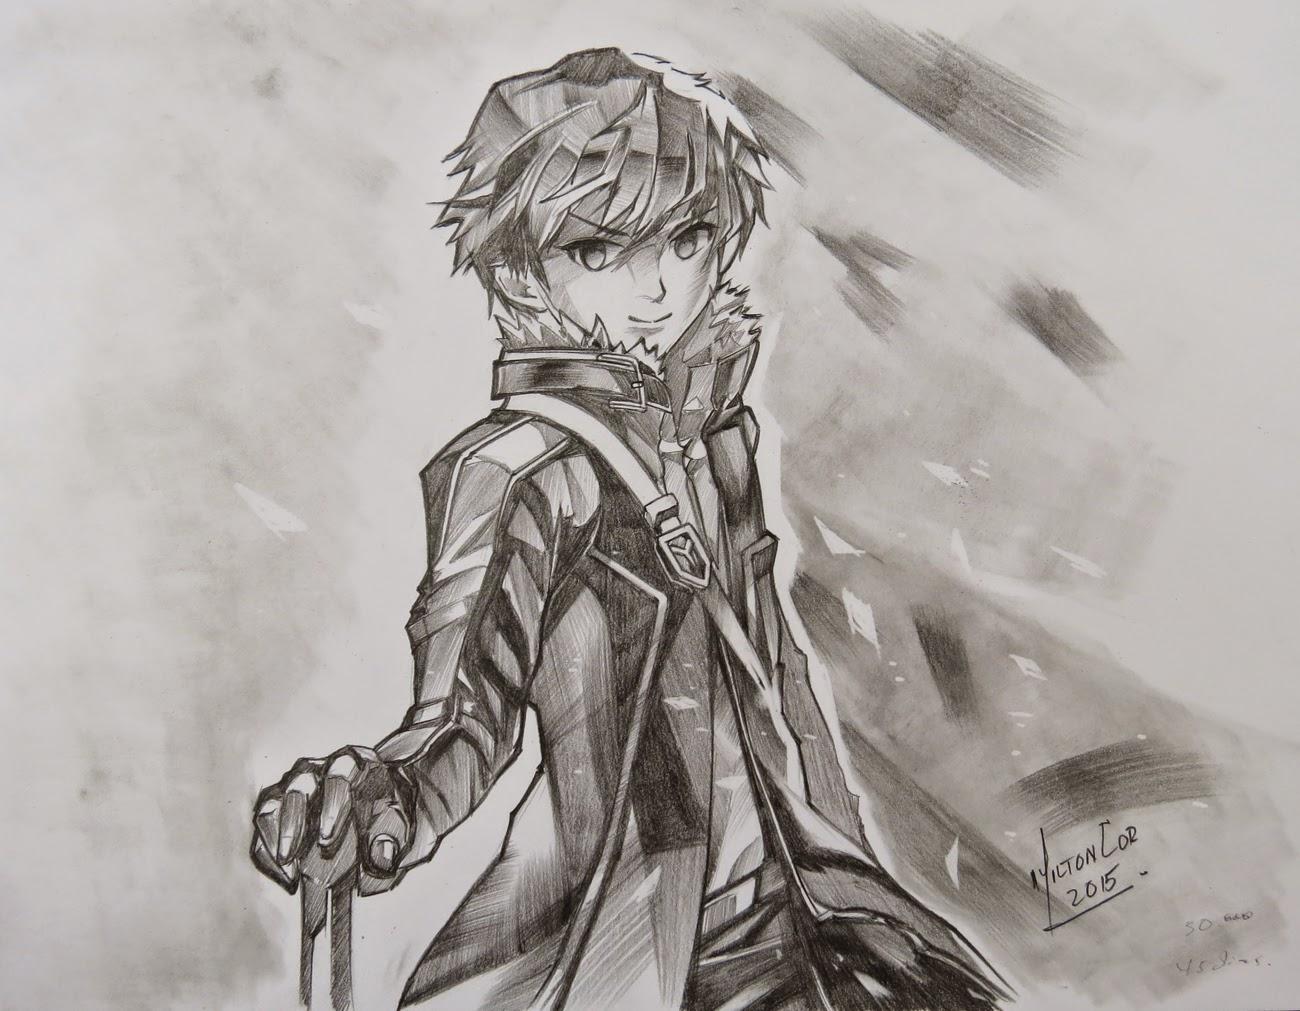 Art painting drawing tips and tutorials drawing kirito from sword